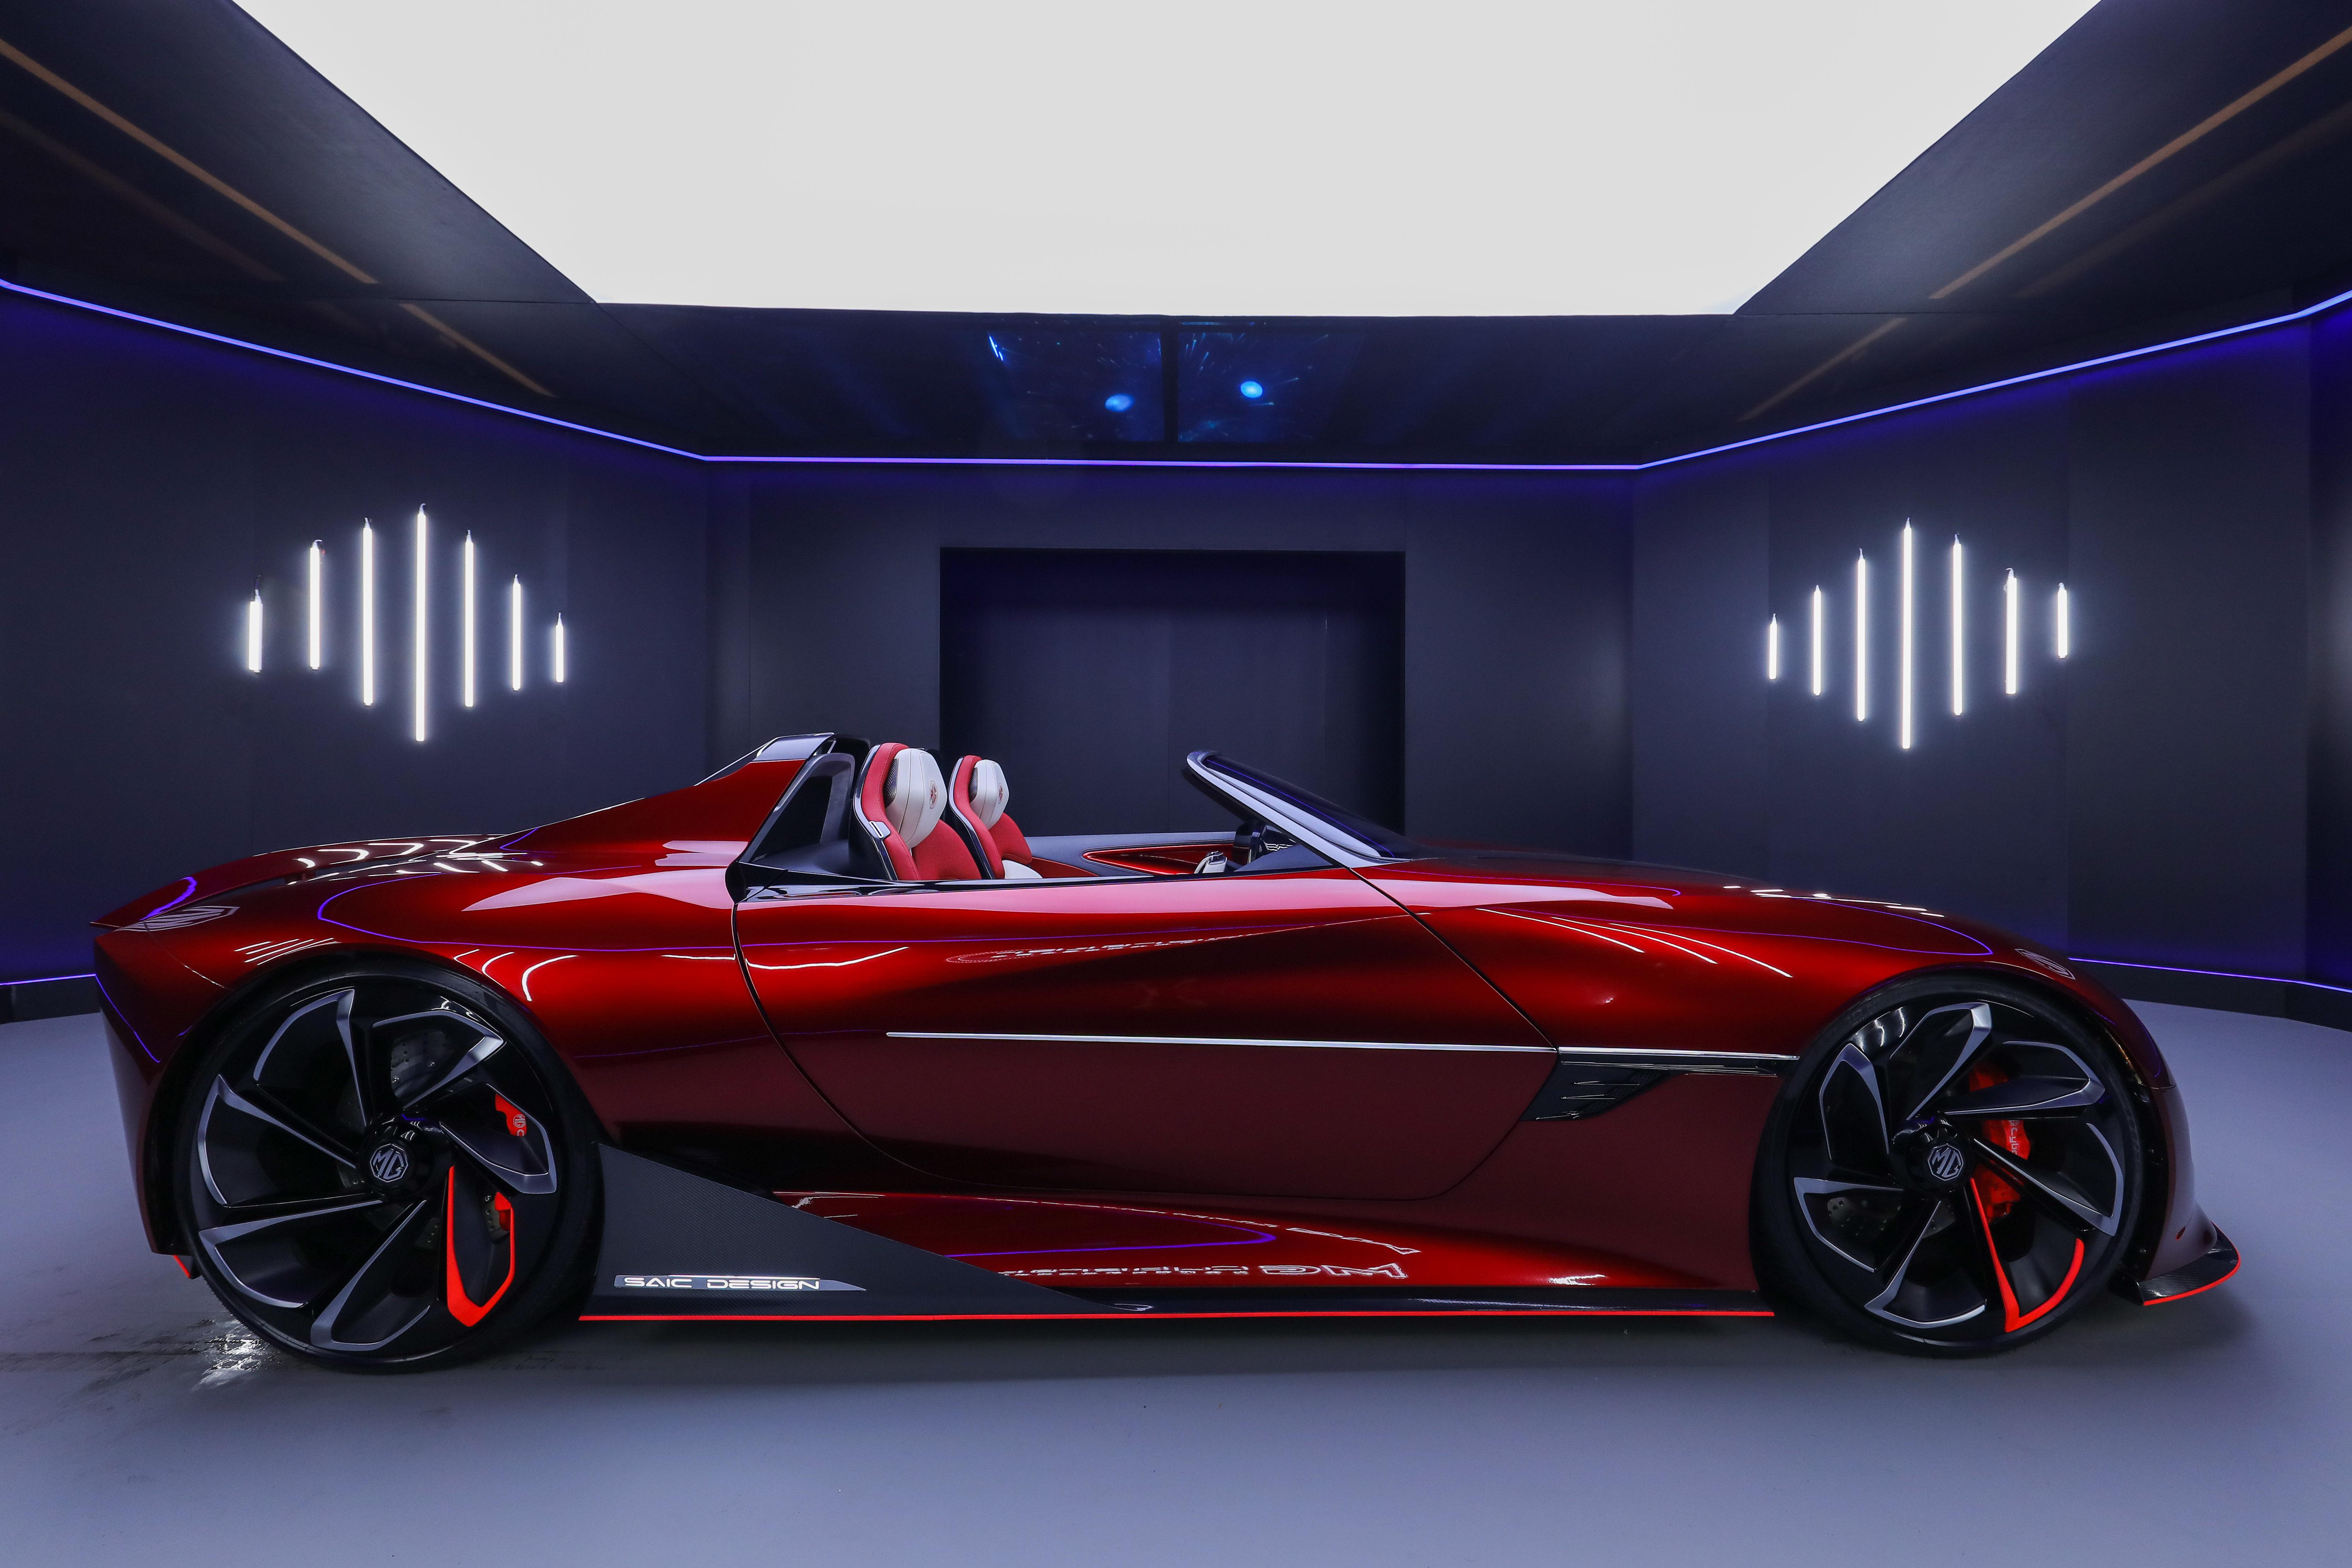 2021 mg cyberster concept 4k 1620170764 - 2021 MG Cyberster Concept 4k - 2021 MG Cyberster Concept 4k wallpapers